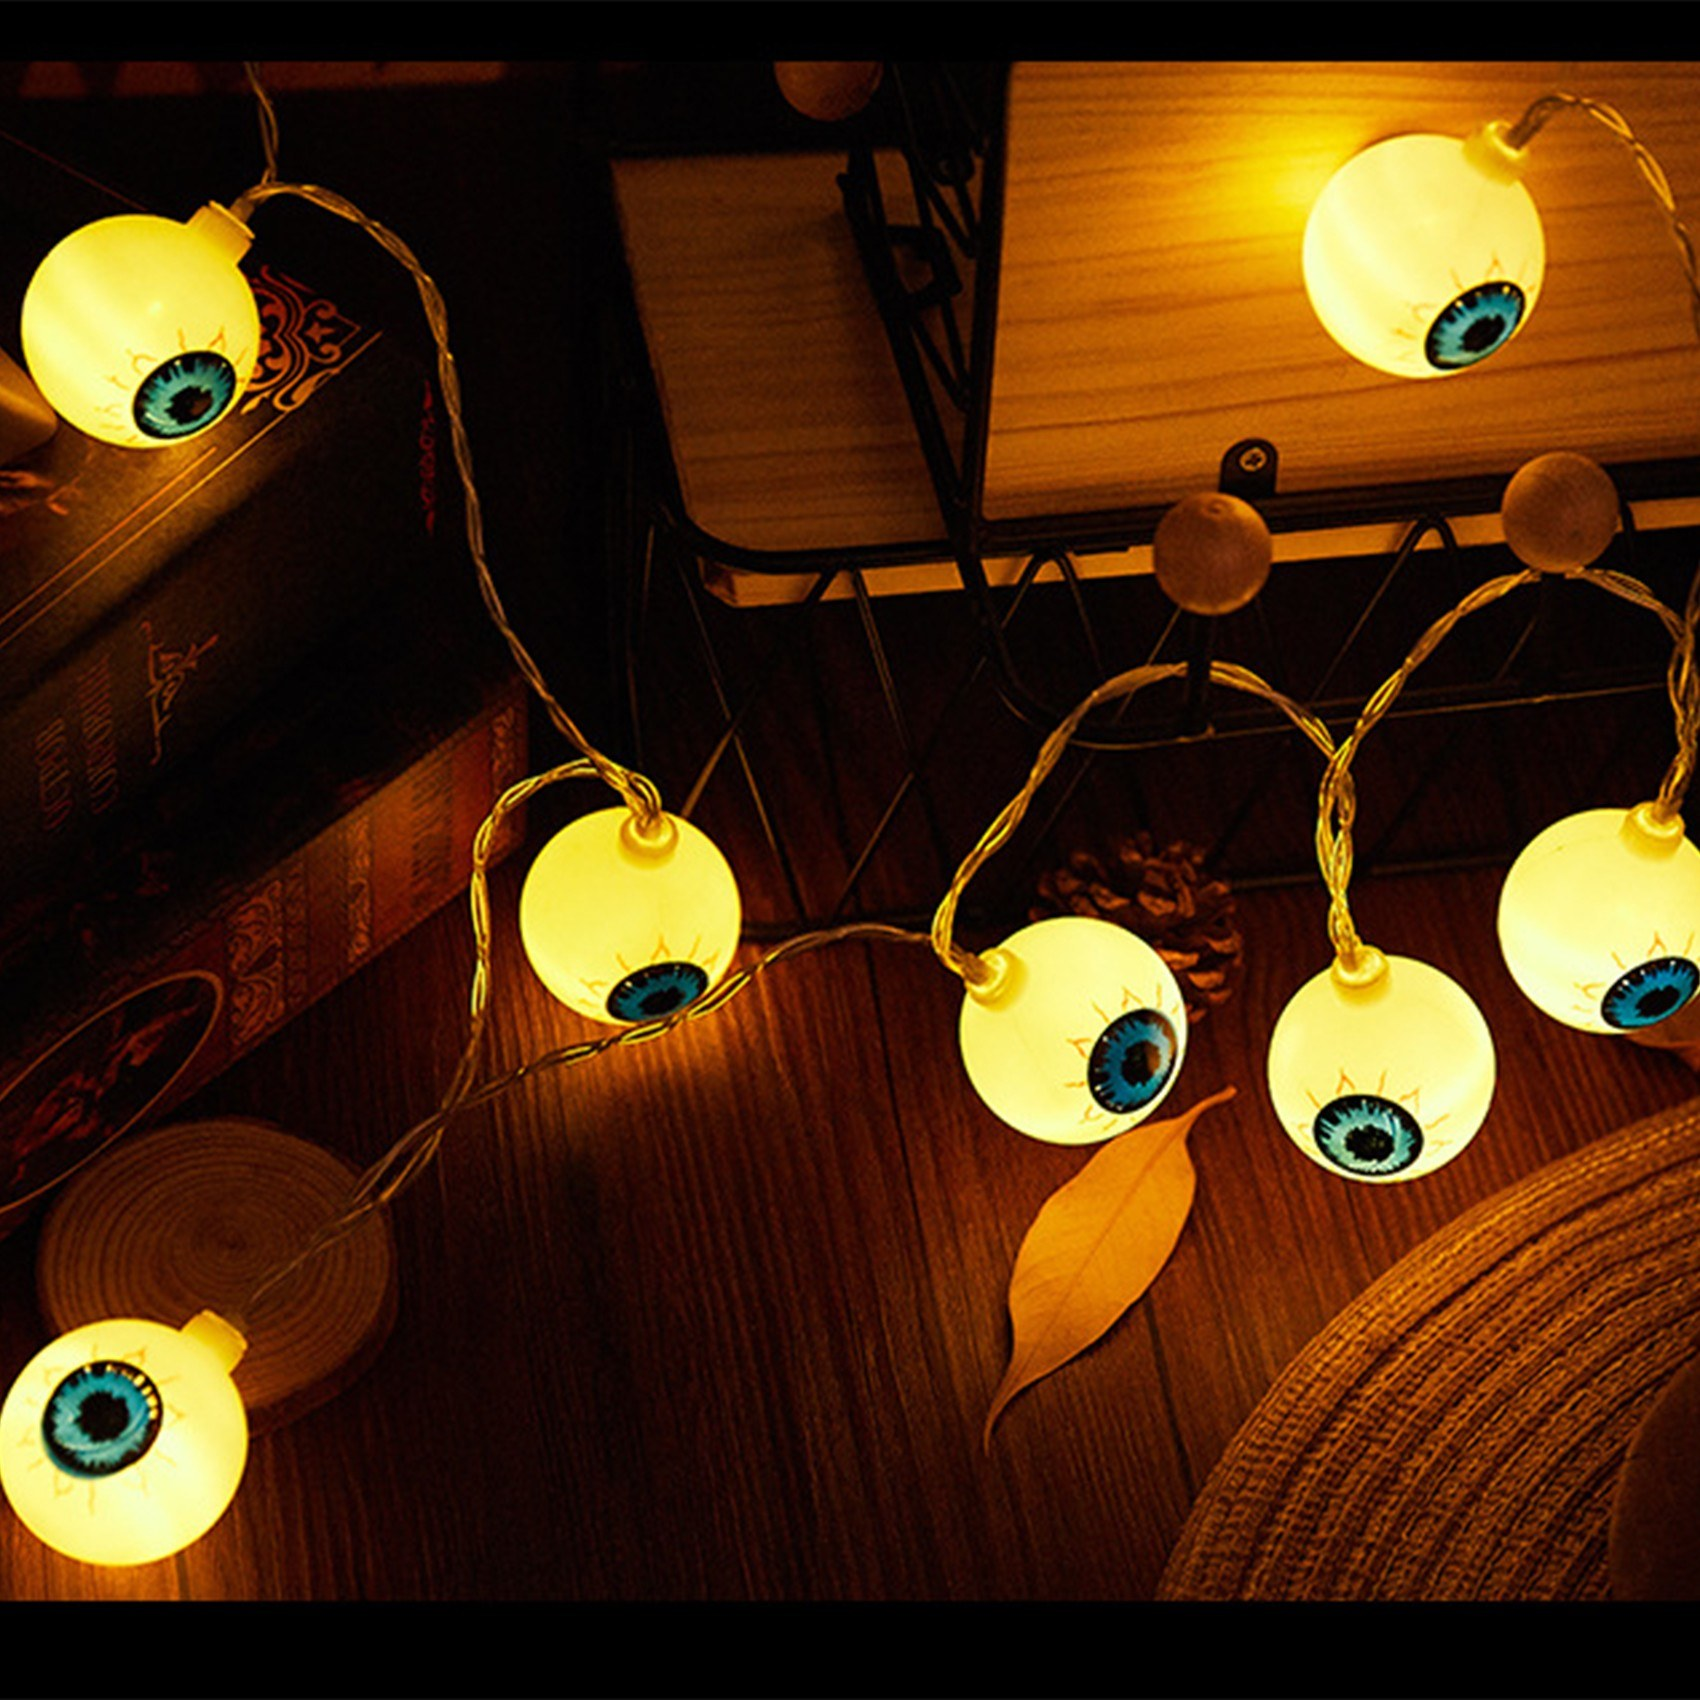 Tomtop - [25% OFF Buy 2+] Halloween String Lights 20 LEDs 10ft Waterproof Twinkle Decoration, $14.40 (Inclusive of VAT)